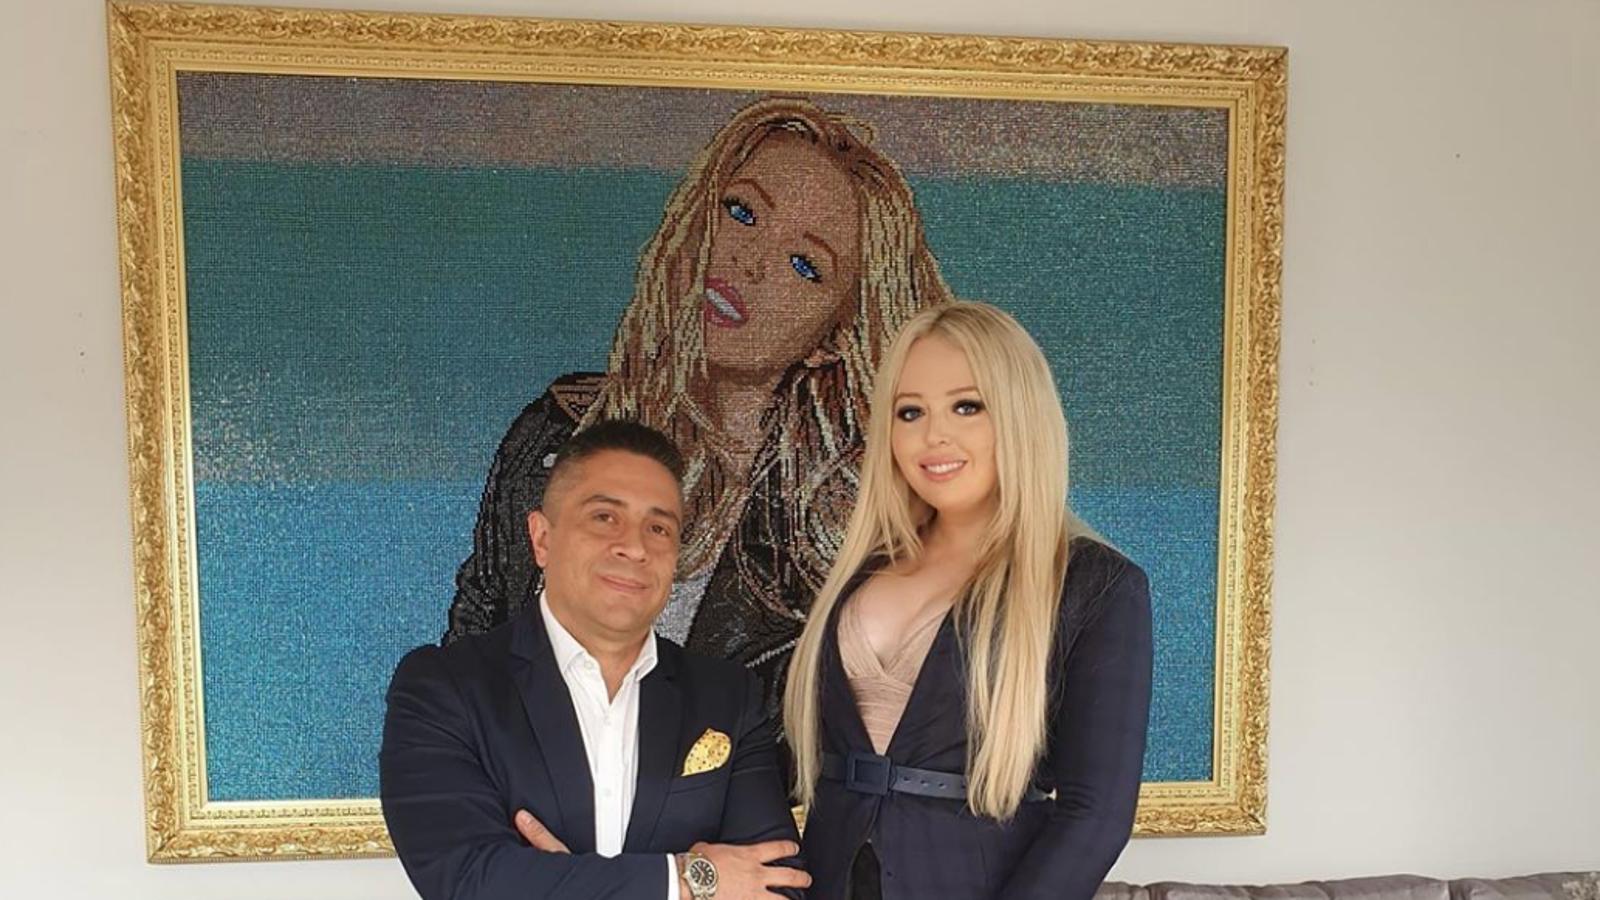 Mr  Bling Colombia's Swarovski Crystal Tiffany Trump Portrait